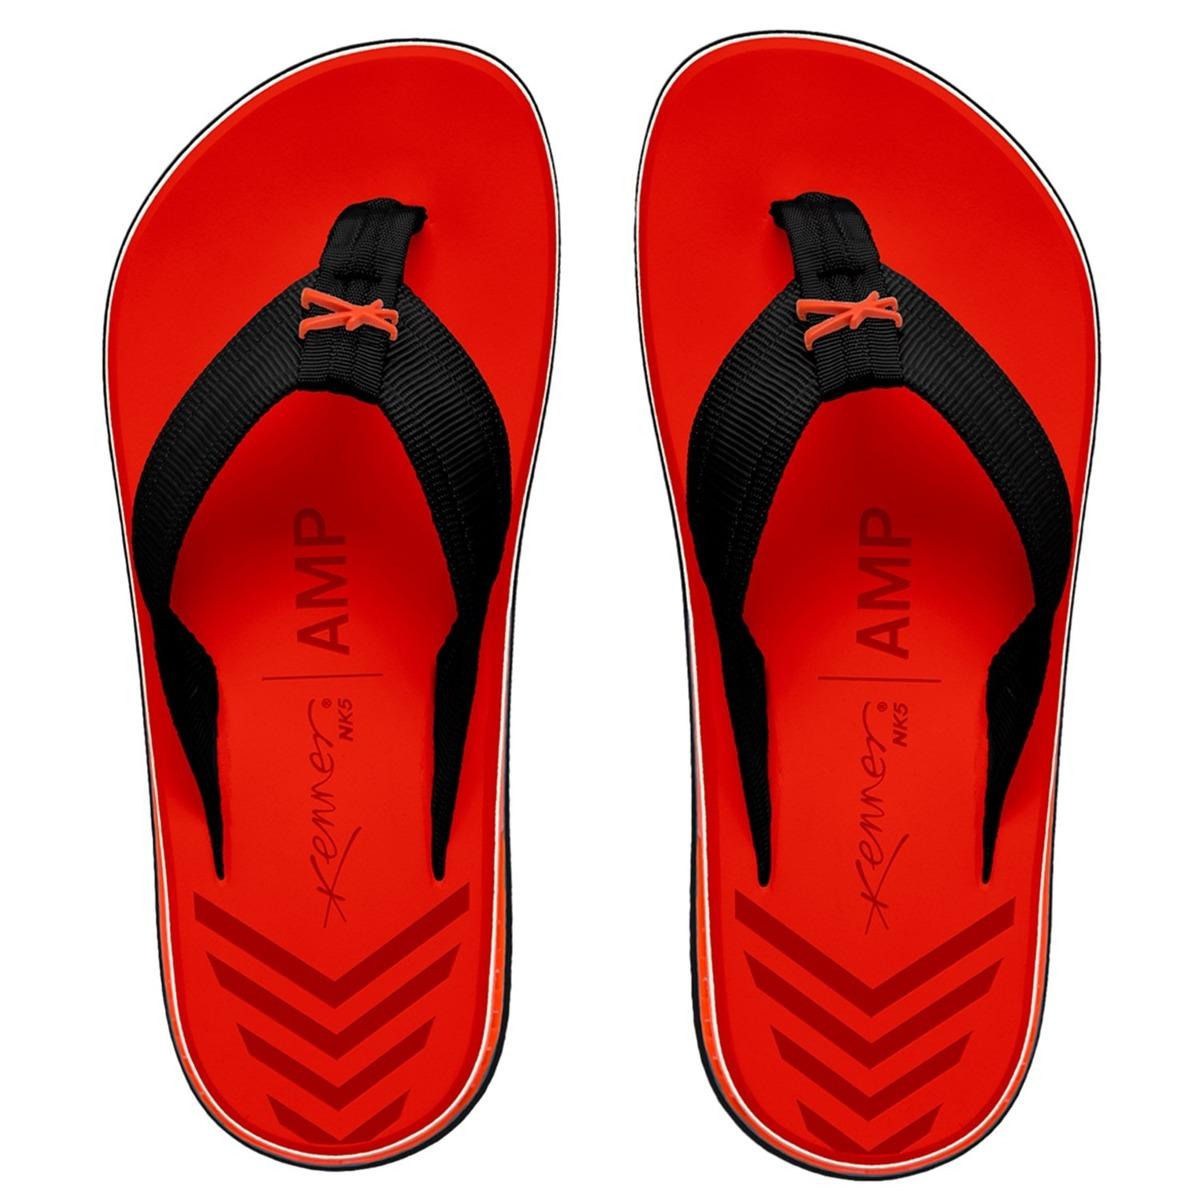 f0403cae5 sandalia chinelo kenner nk5 amp original frete gratis. Carregando zoom.